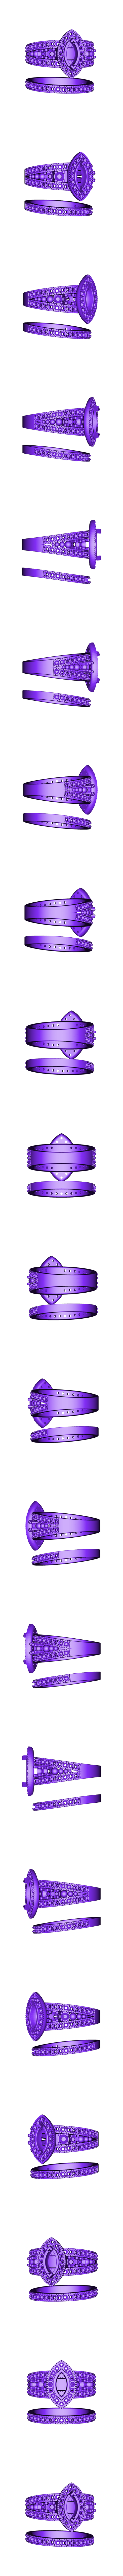 RG25659.stl Download STL file 3D Jewelry CAD File Wedding Bridal Ring Set • 3D printer model, VR3D